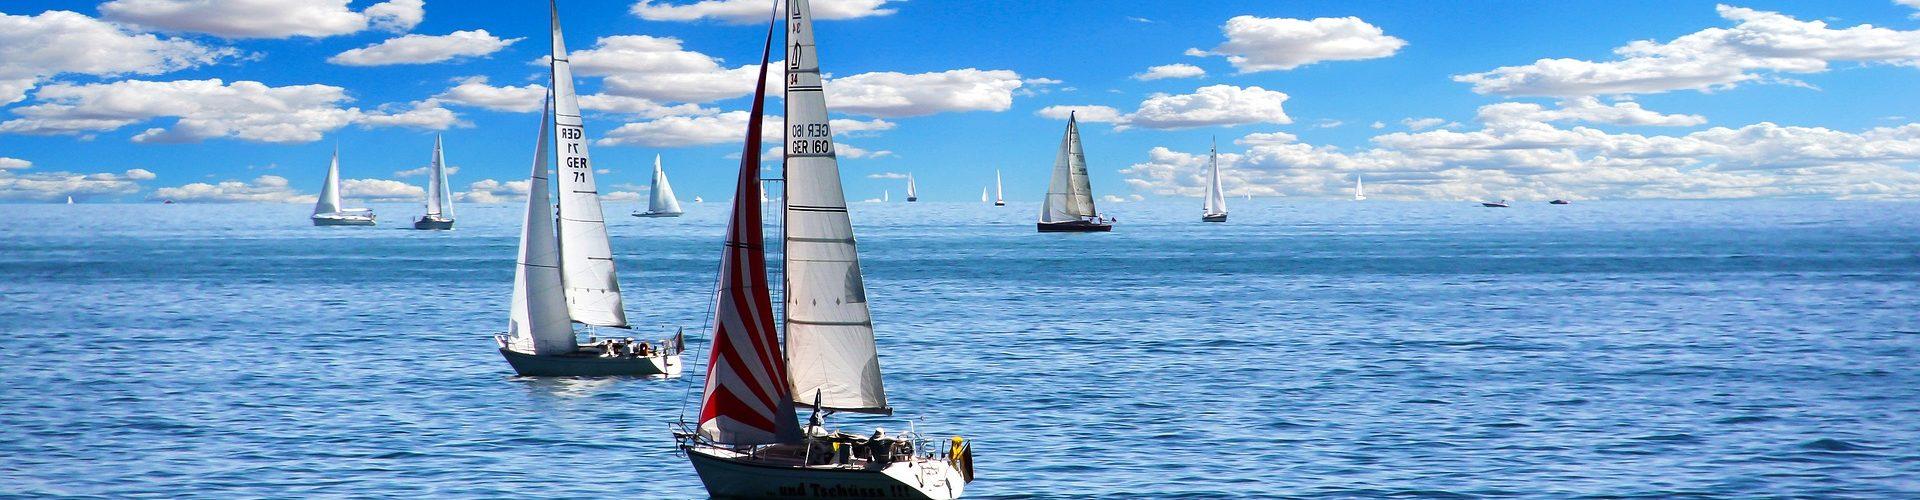 segeln lernen in Göhren Lebbin segelschein machen in Göhren Lebbin 1920x500 - Segeln lernen in Göhren-Lebbin